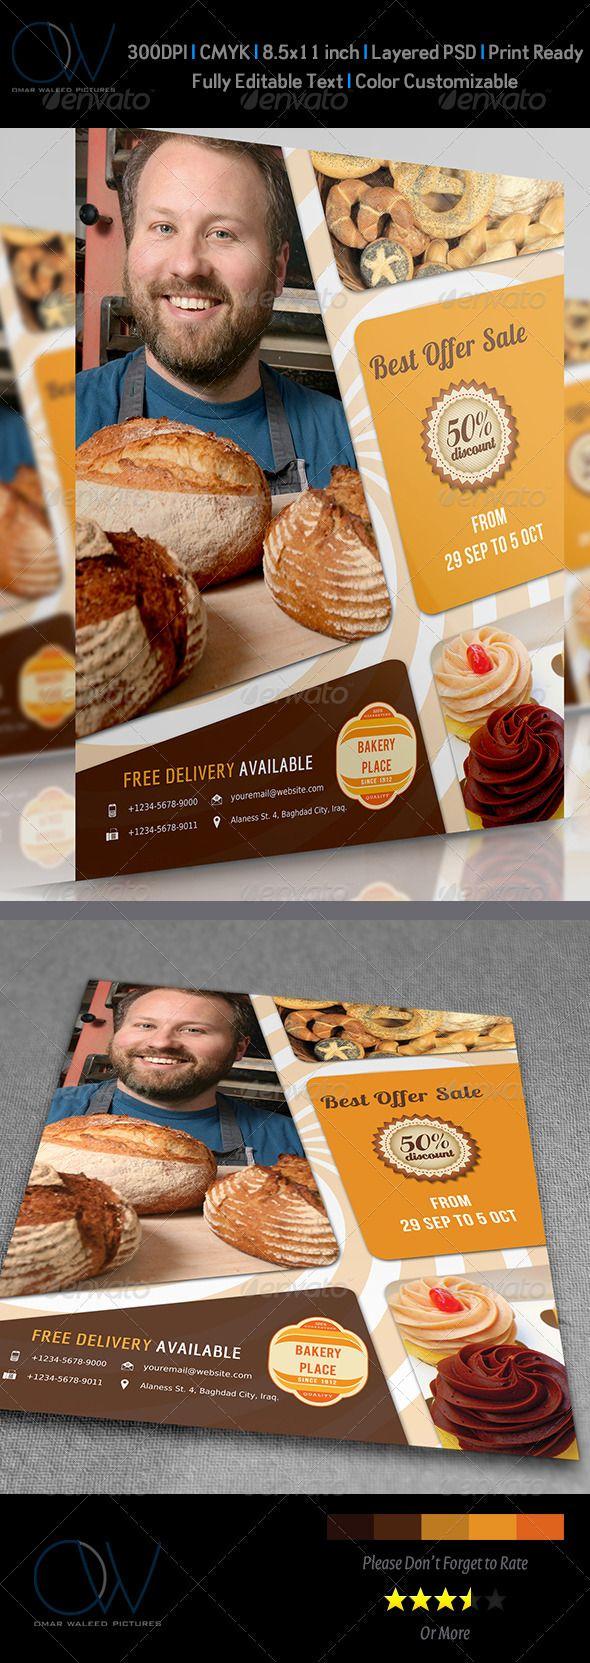 #Bakery Flyer - #Restaurant #Flyers Download here: https://graphicriver.net/item/bakery-flyer/3621112?ref=alena994